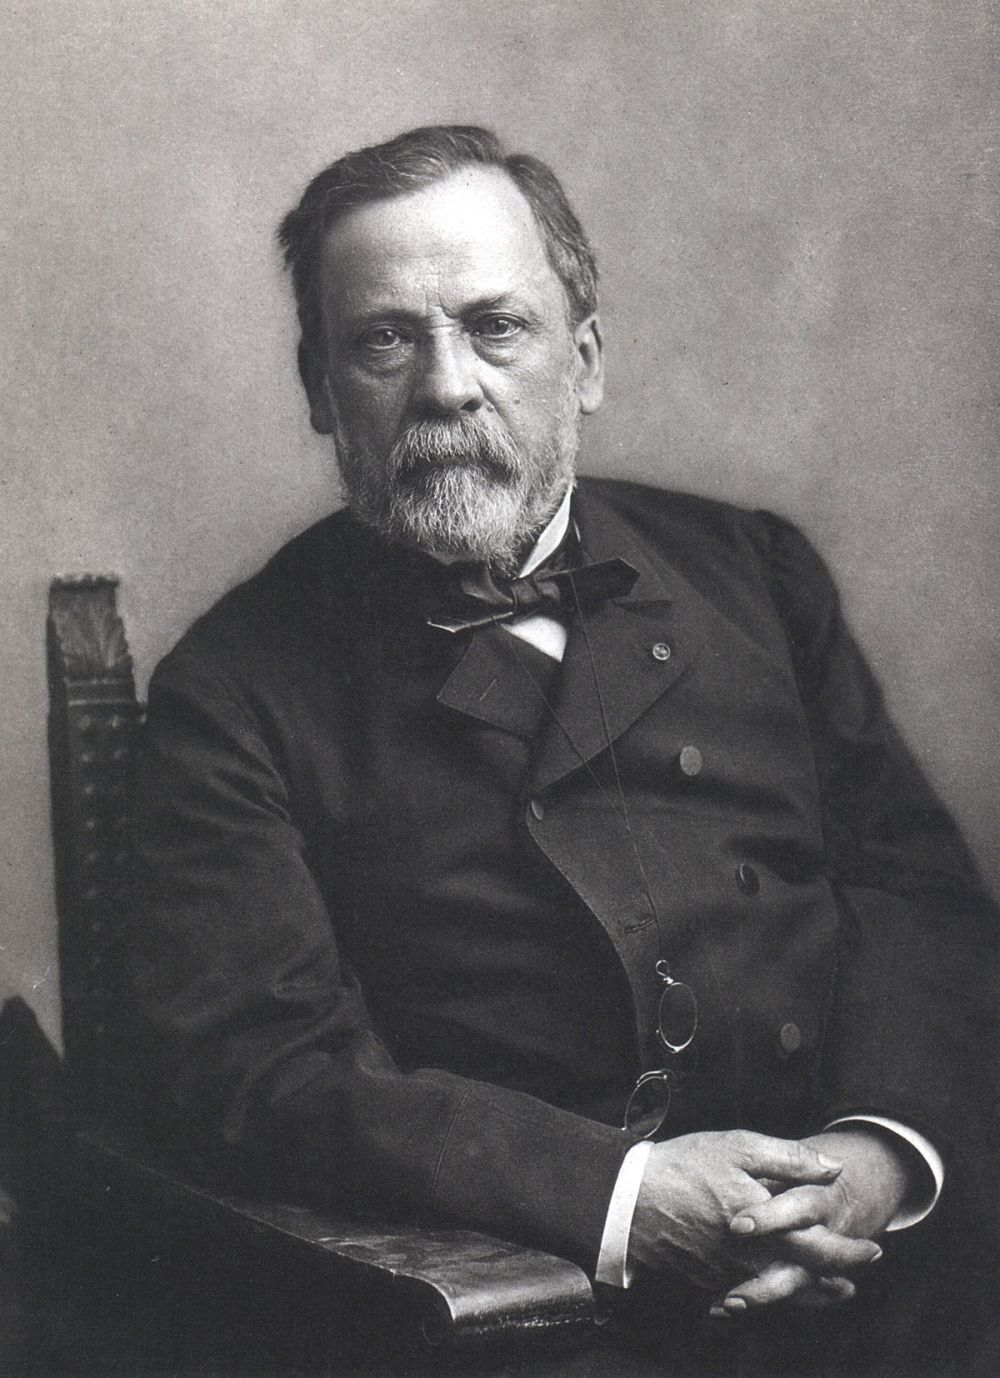 1200px-Louis_Pasteur,_foto_av_Félix_Nadar